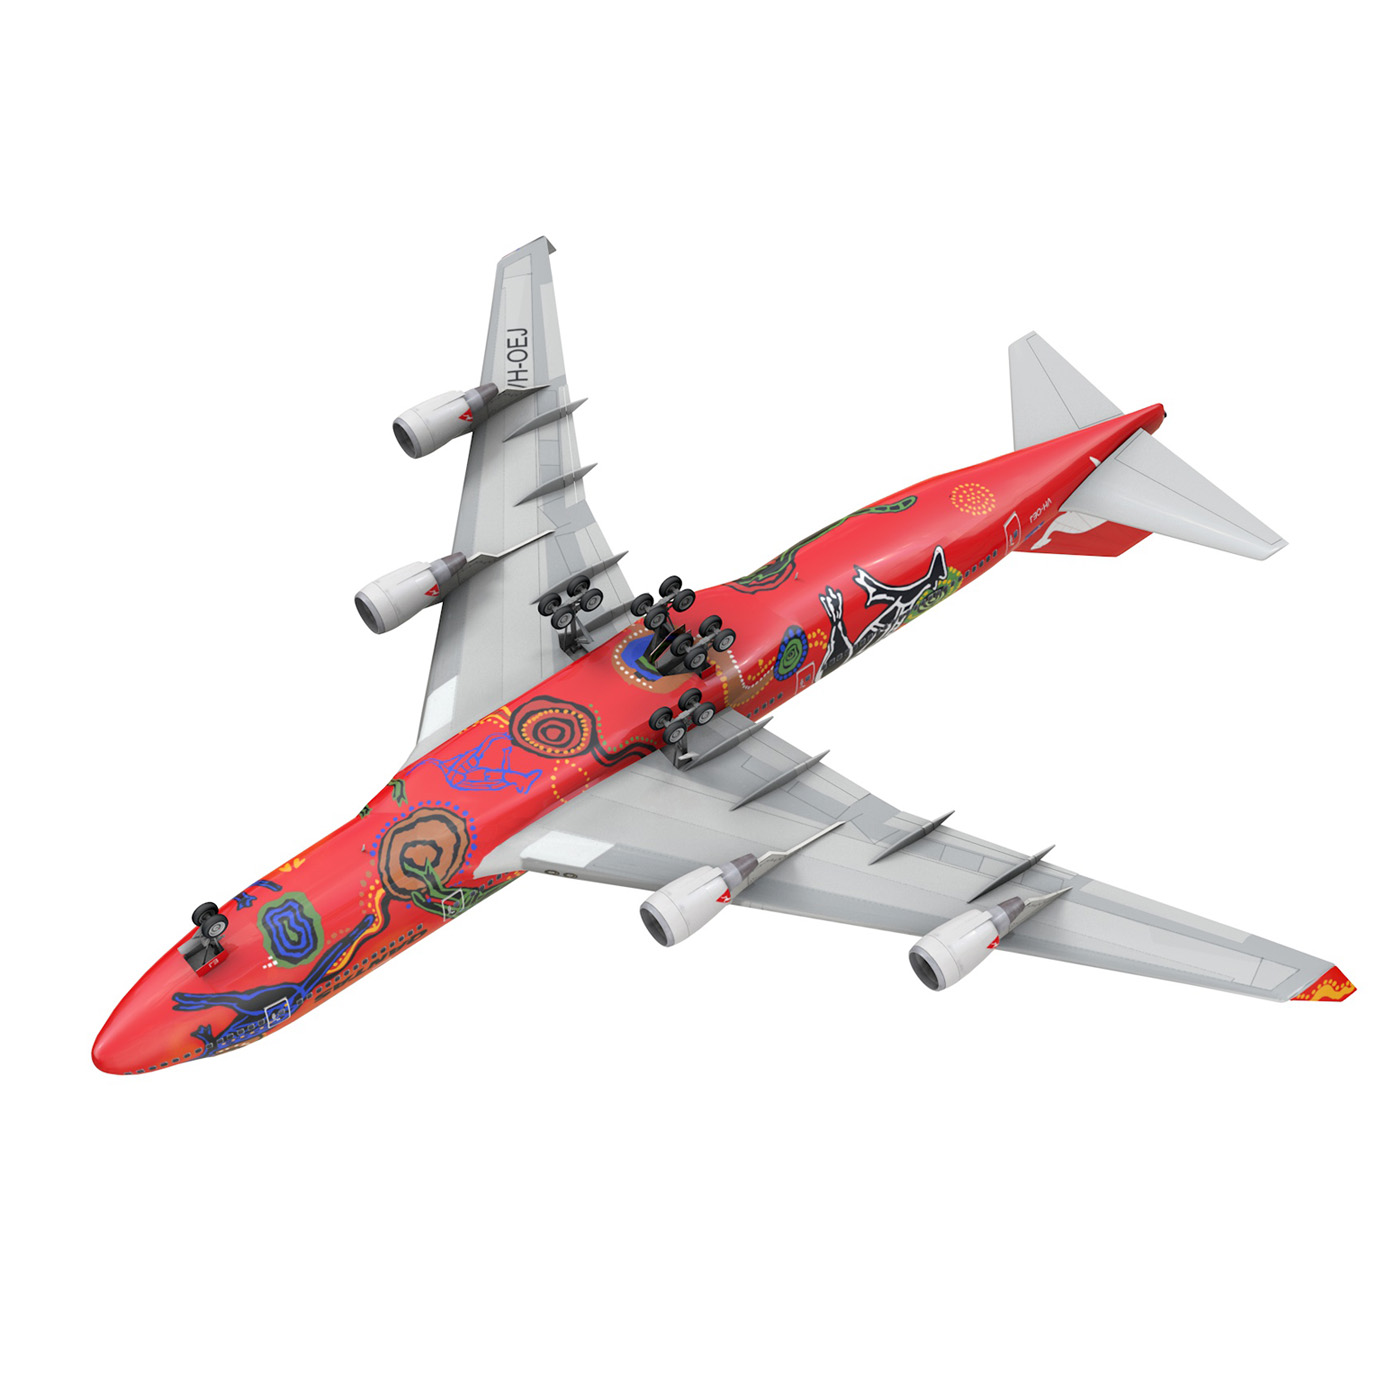 boeing 747 qantas wunala dreaming 3d model 3ds fbx c4d lwo obj 281796